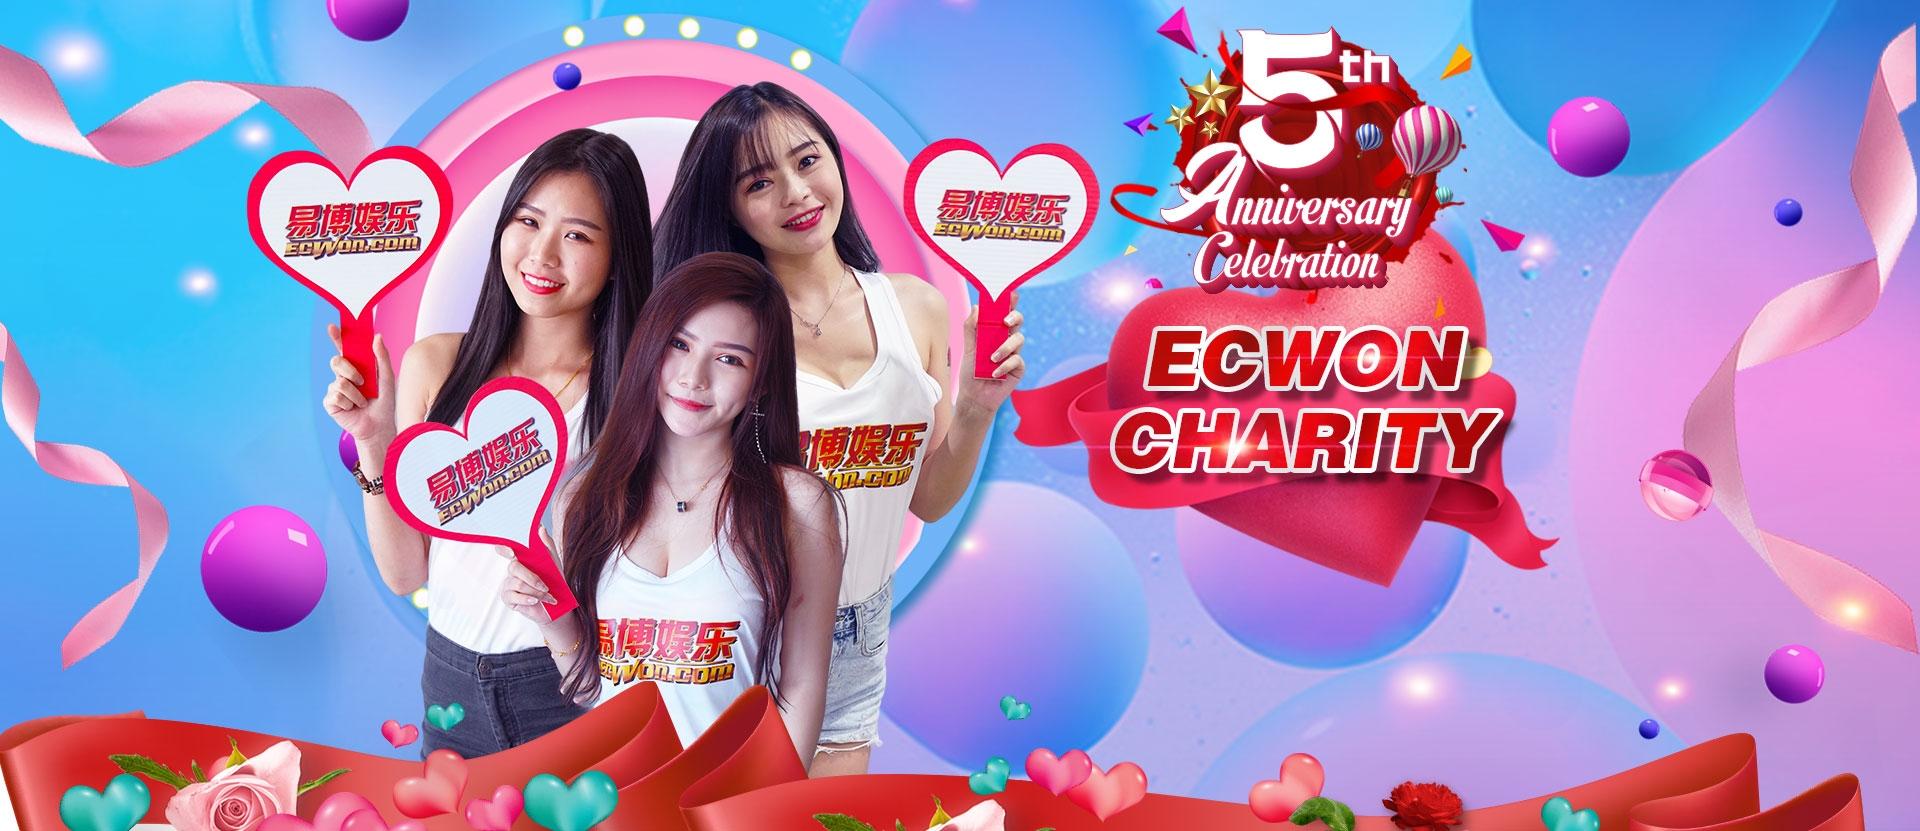 Ecwonsg Live Online Casino Singa (@ecwonsg) Cover Image